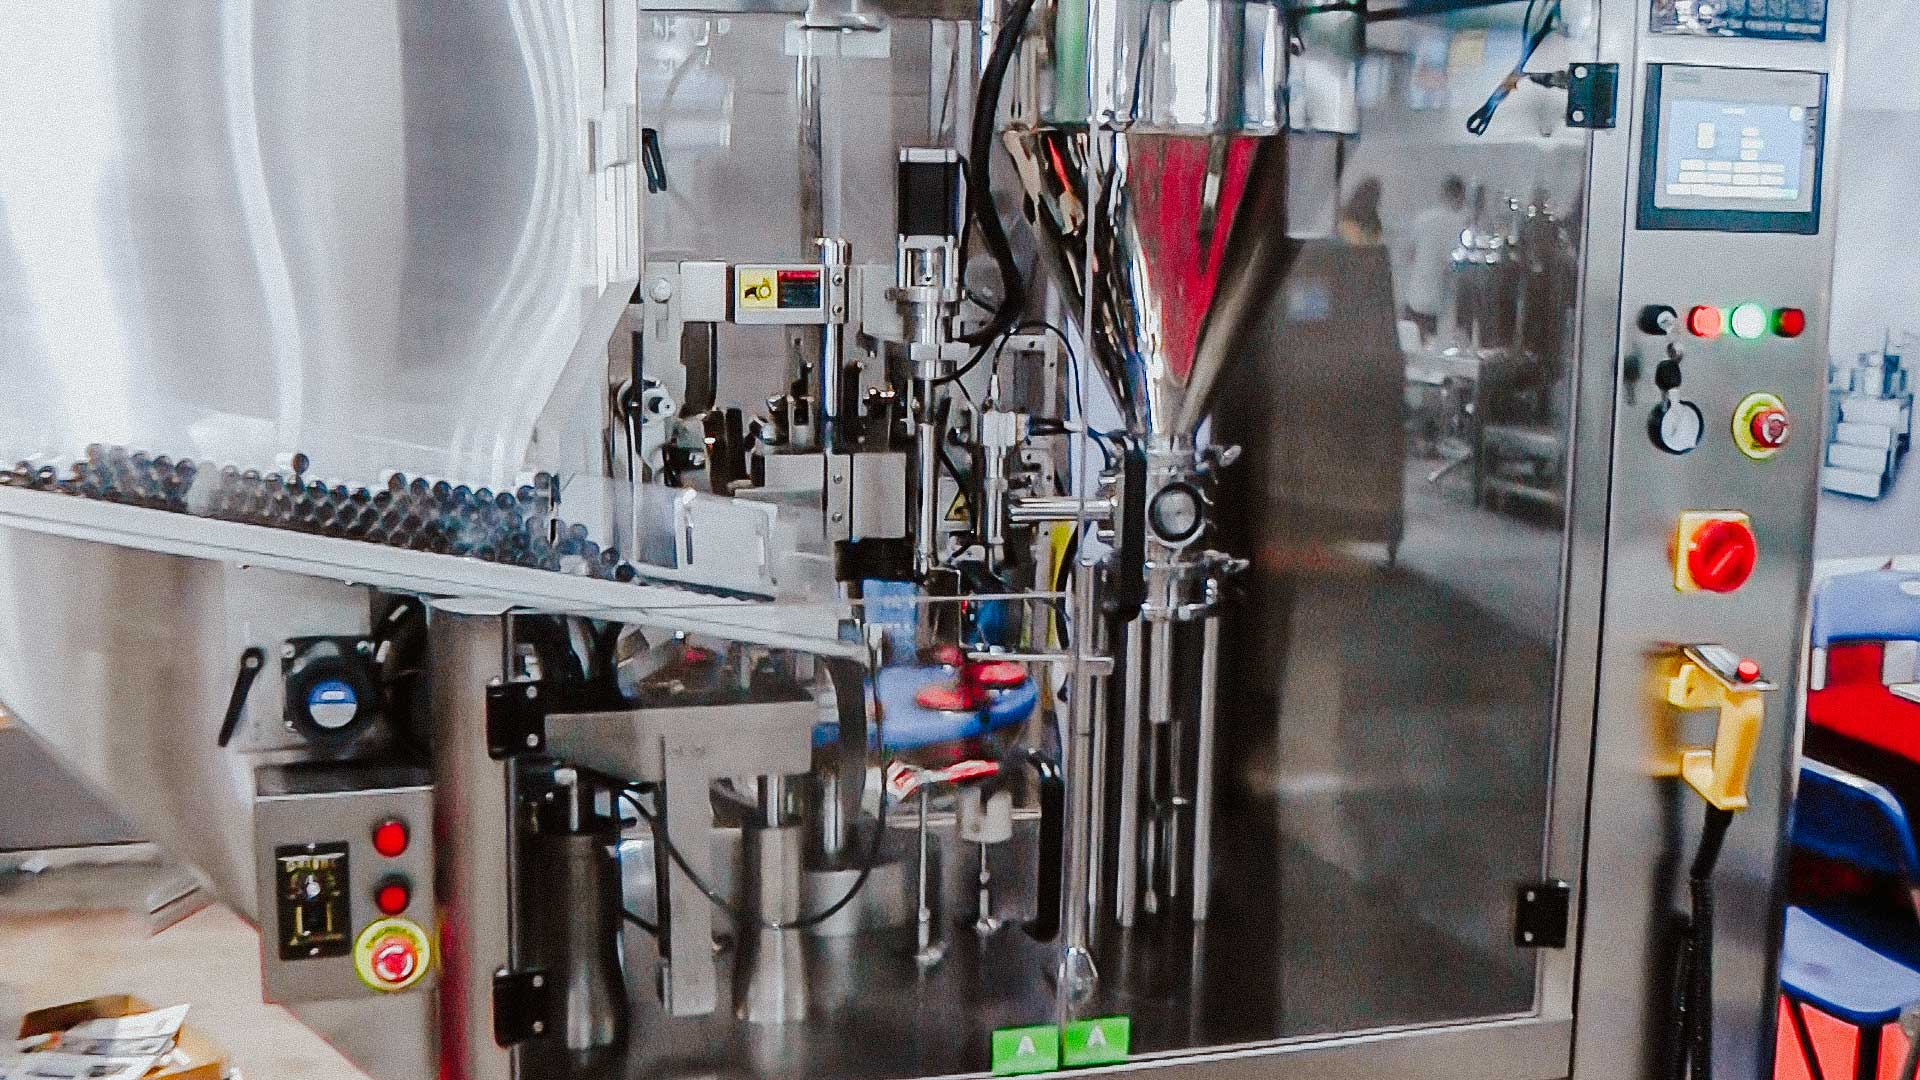 Plastic tubes cream filling machine and sealing edge puts shelf life